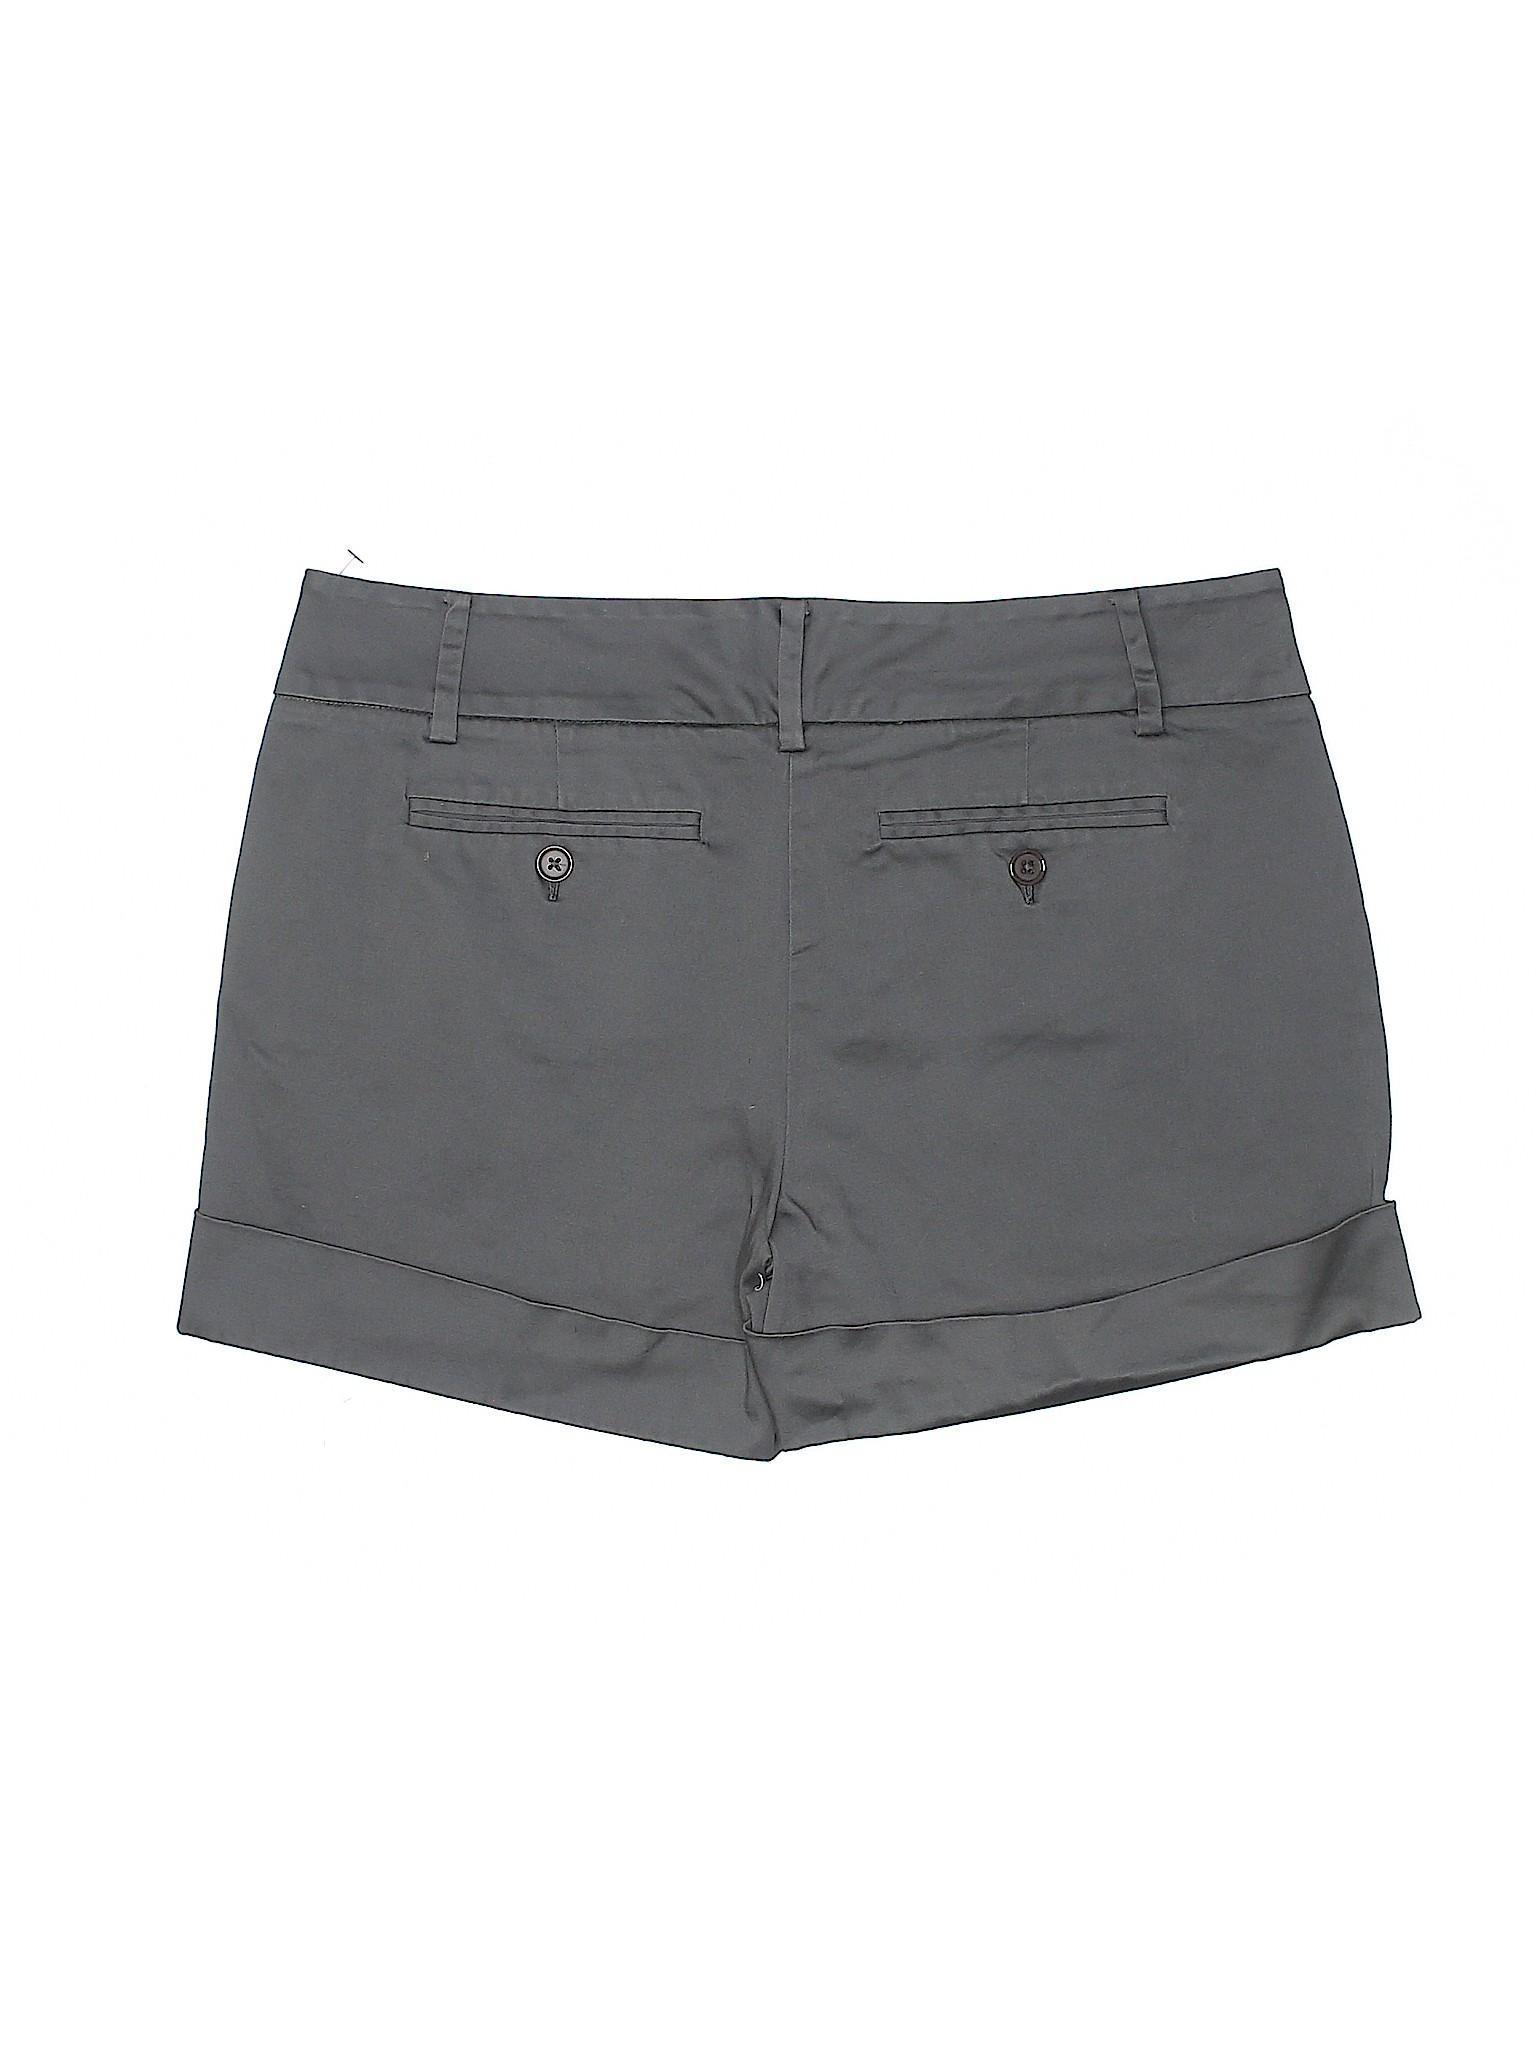 Boutique Shorts amp; York Khaki New Company RnR1F7H